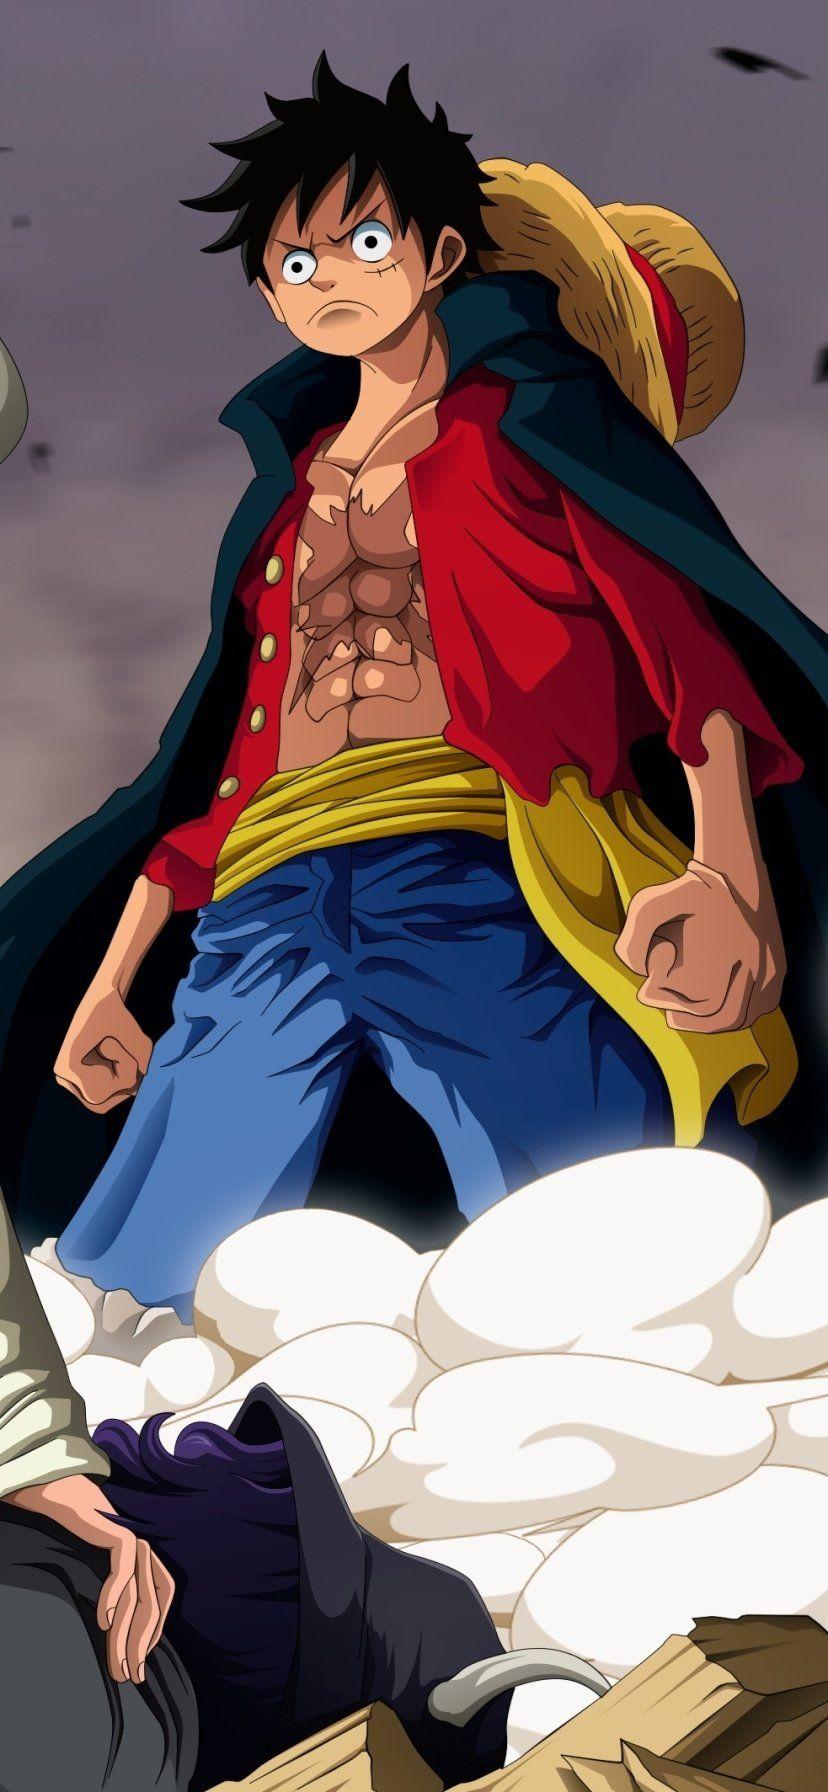 خلفيات انمي ون بيس One Piece للجوال One Piece Luffy One Piece Luffy